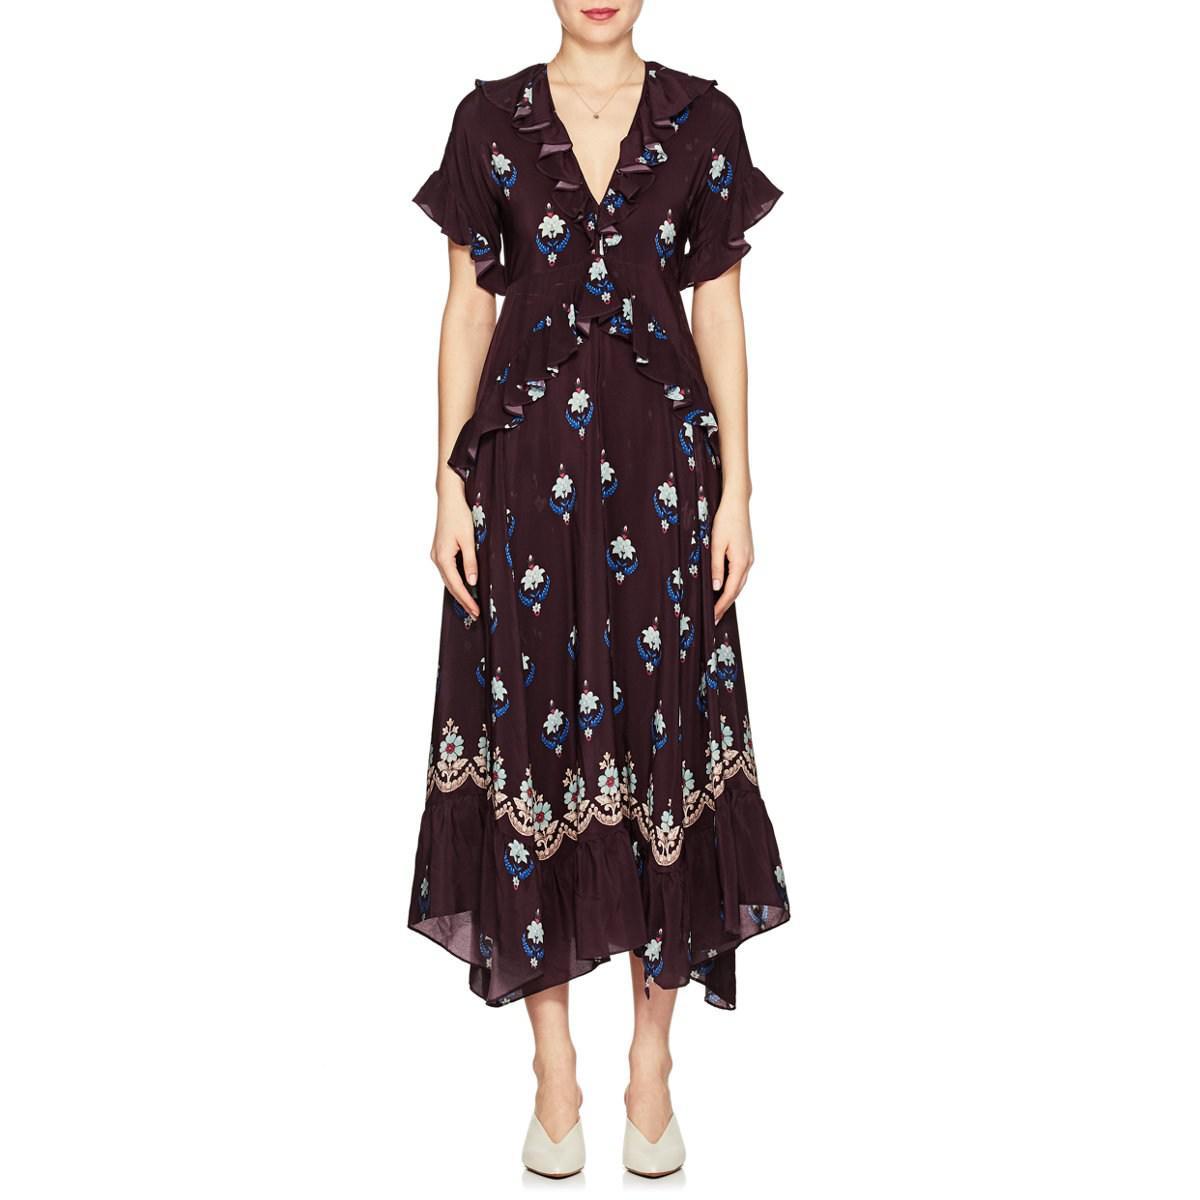 Really Cheap Shoes Online Discount 100% Authentic Womens Stevie Floral Crêpe De Chine Maxi Dress Warm Grey Outlet Store Online mitZXi4